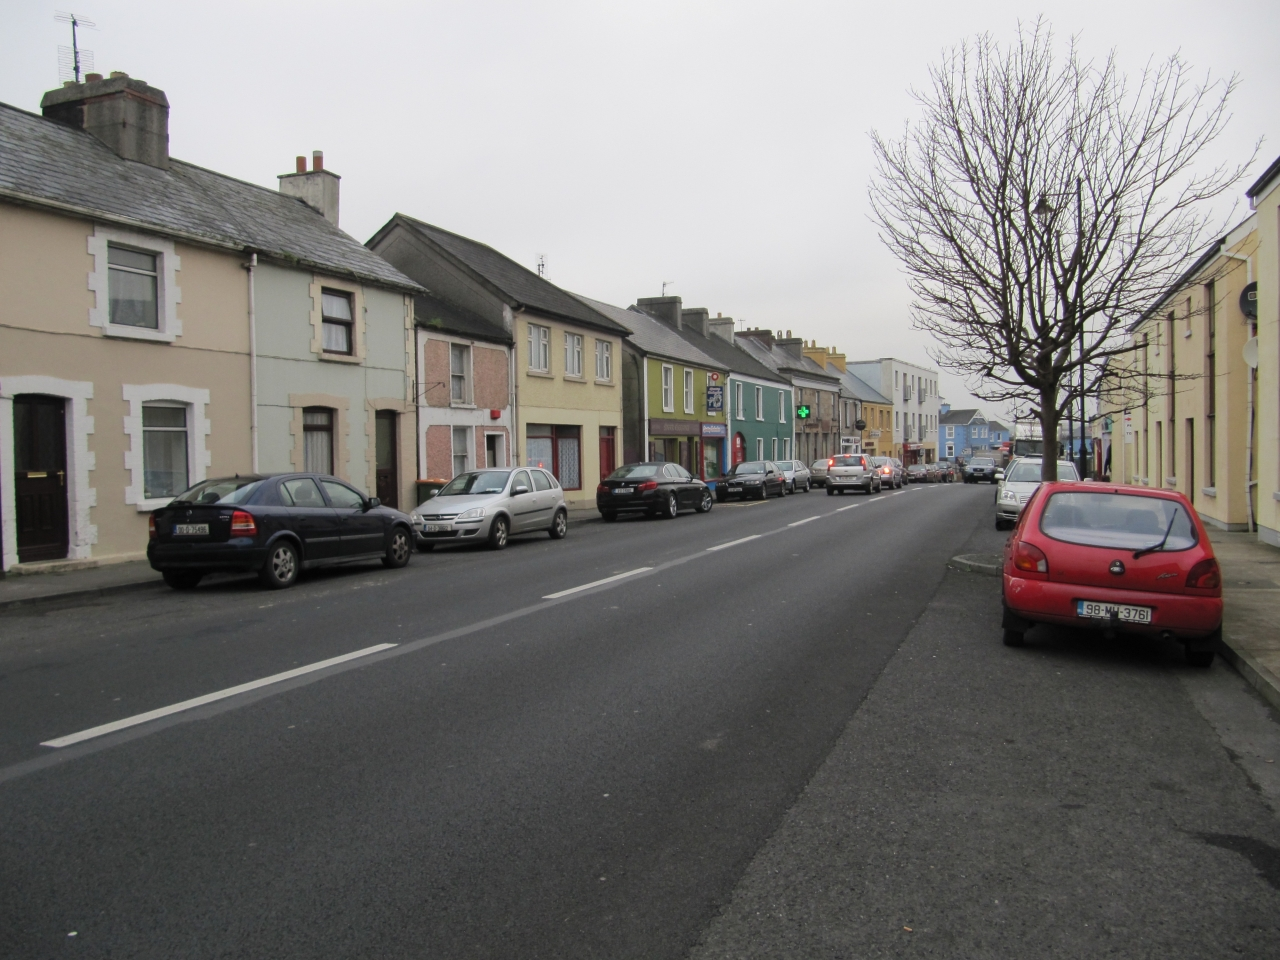 Barrack Street